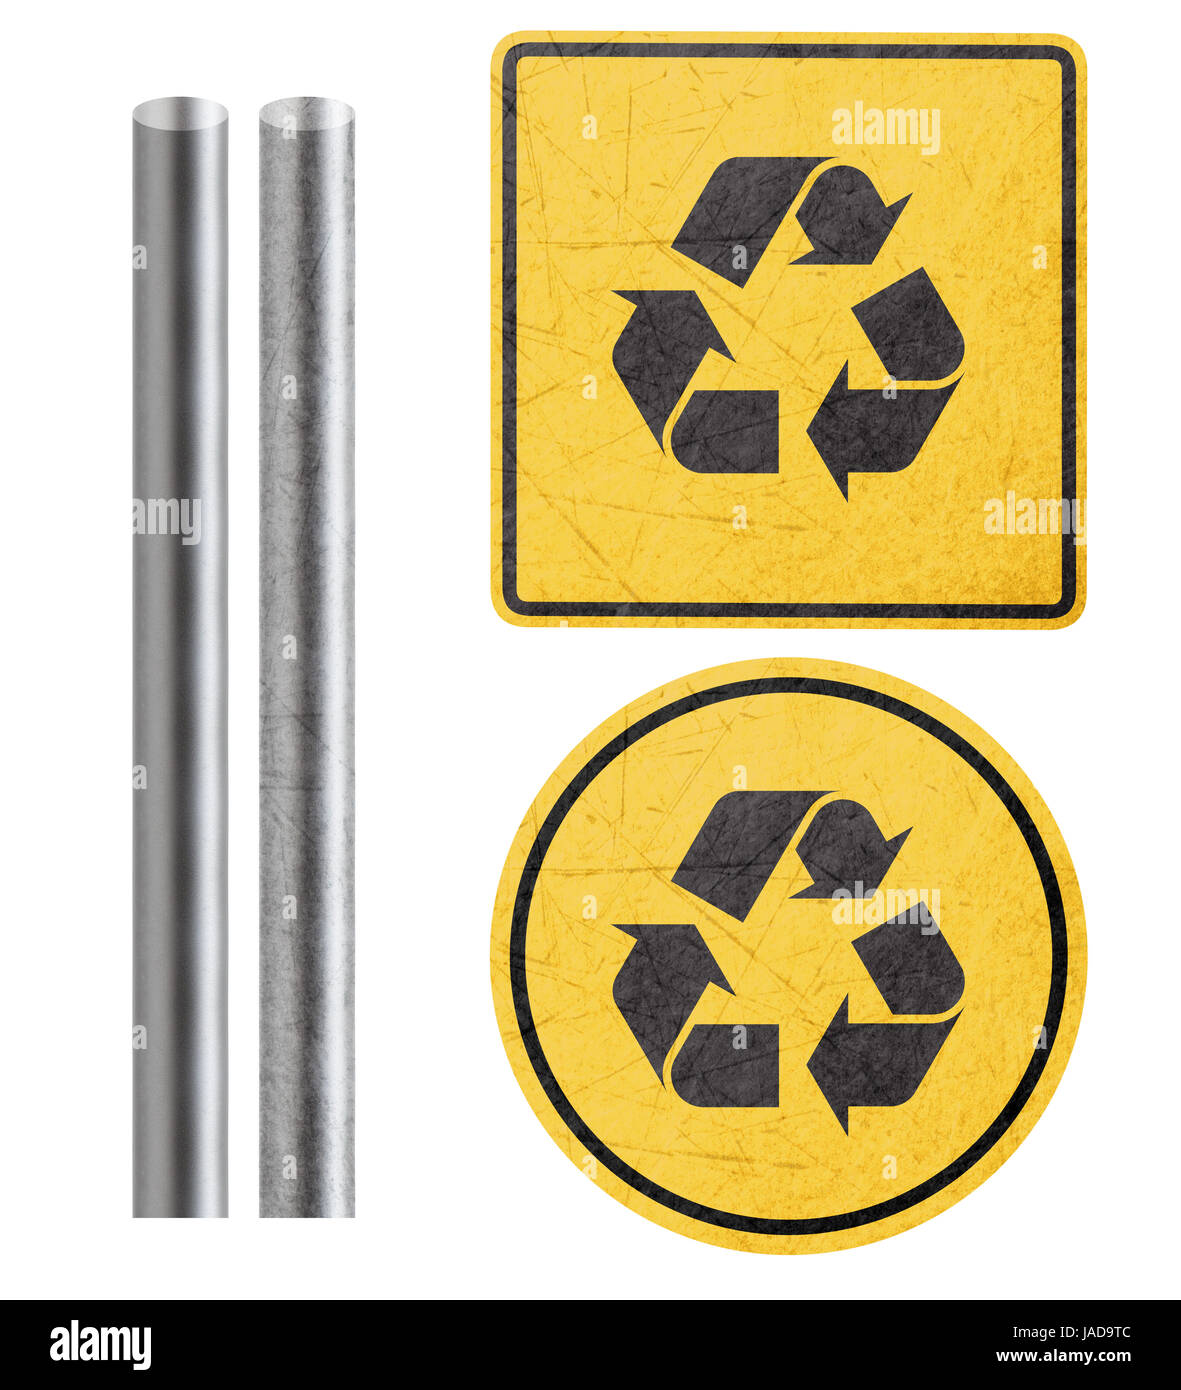 Recycle symbol on yellow sign with metal bar isolated in white recycle symbol on yellow sign with metal bar isolated in white with clipping work path buycottarizona Choice Image